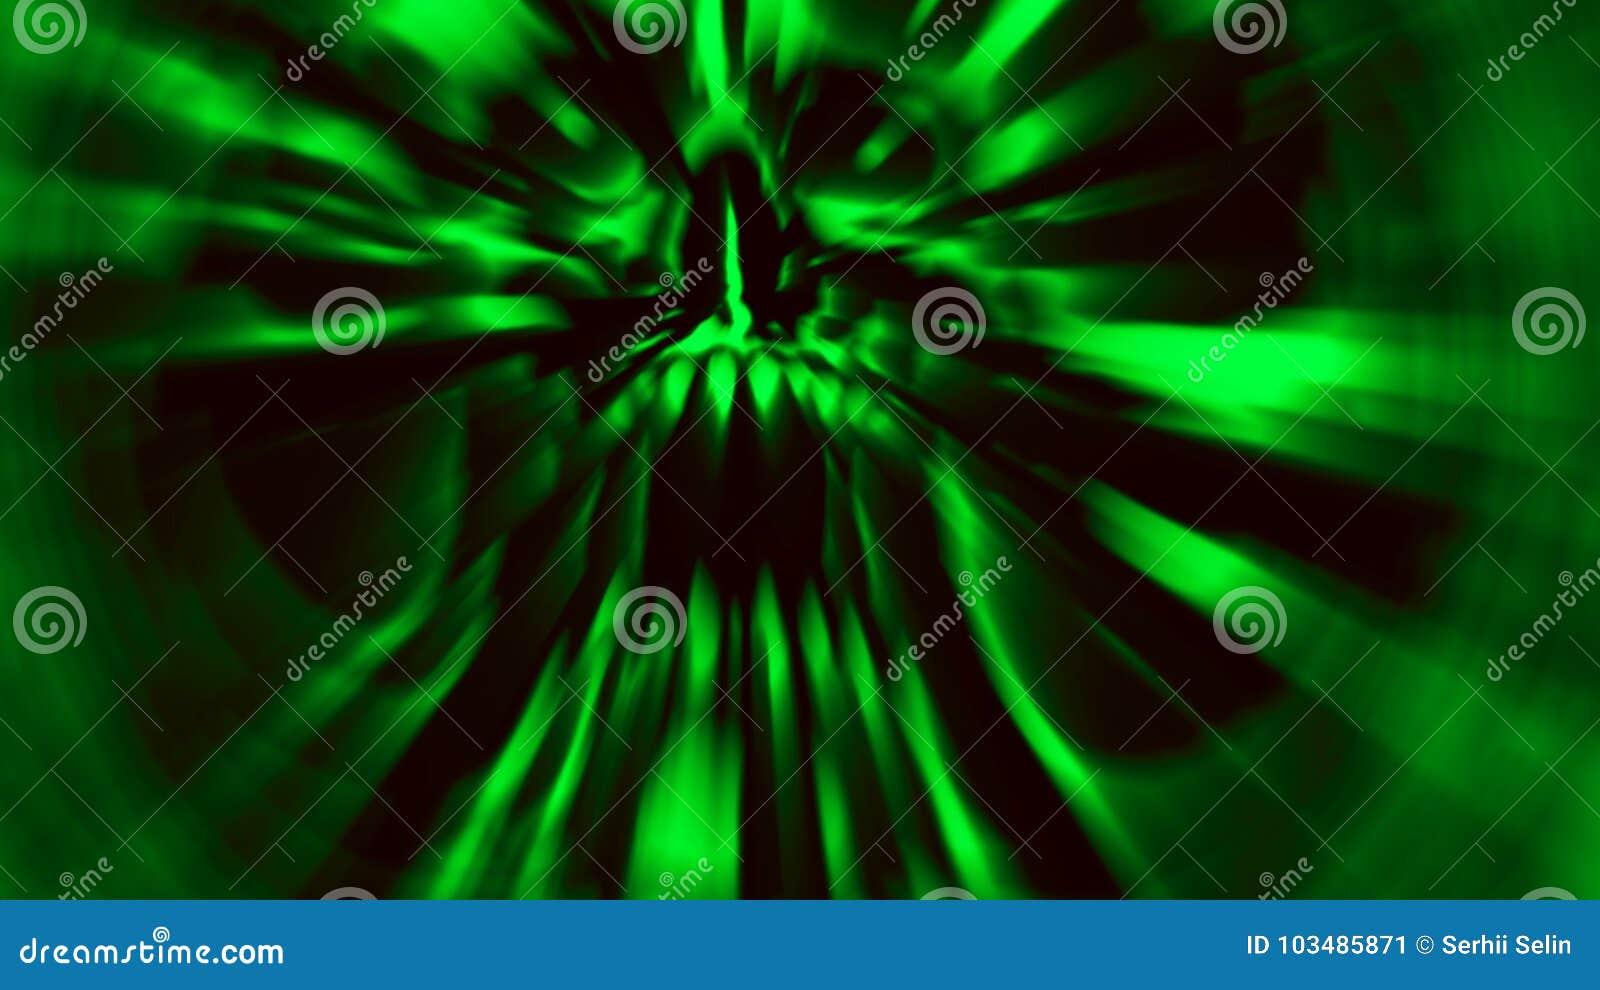 Scary green demon skull. Illustration in genre of horror.